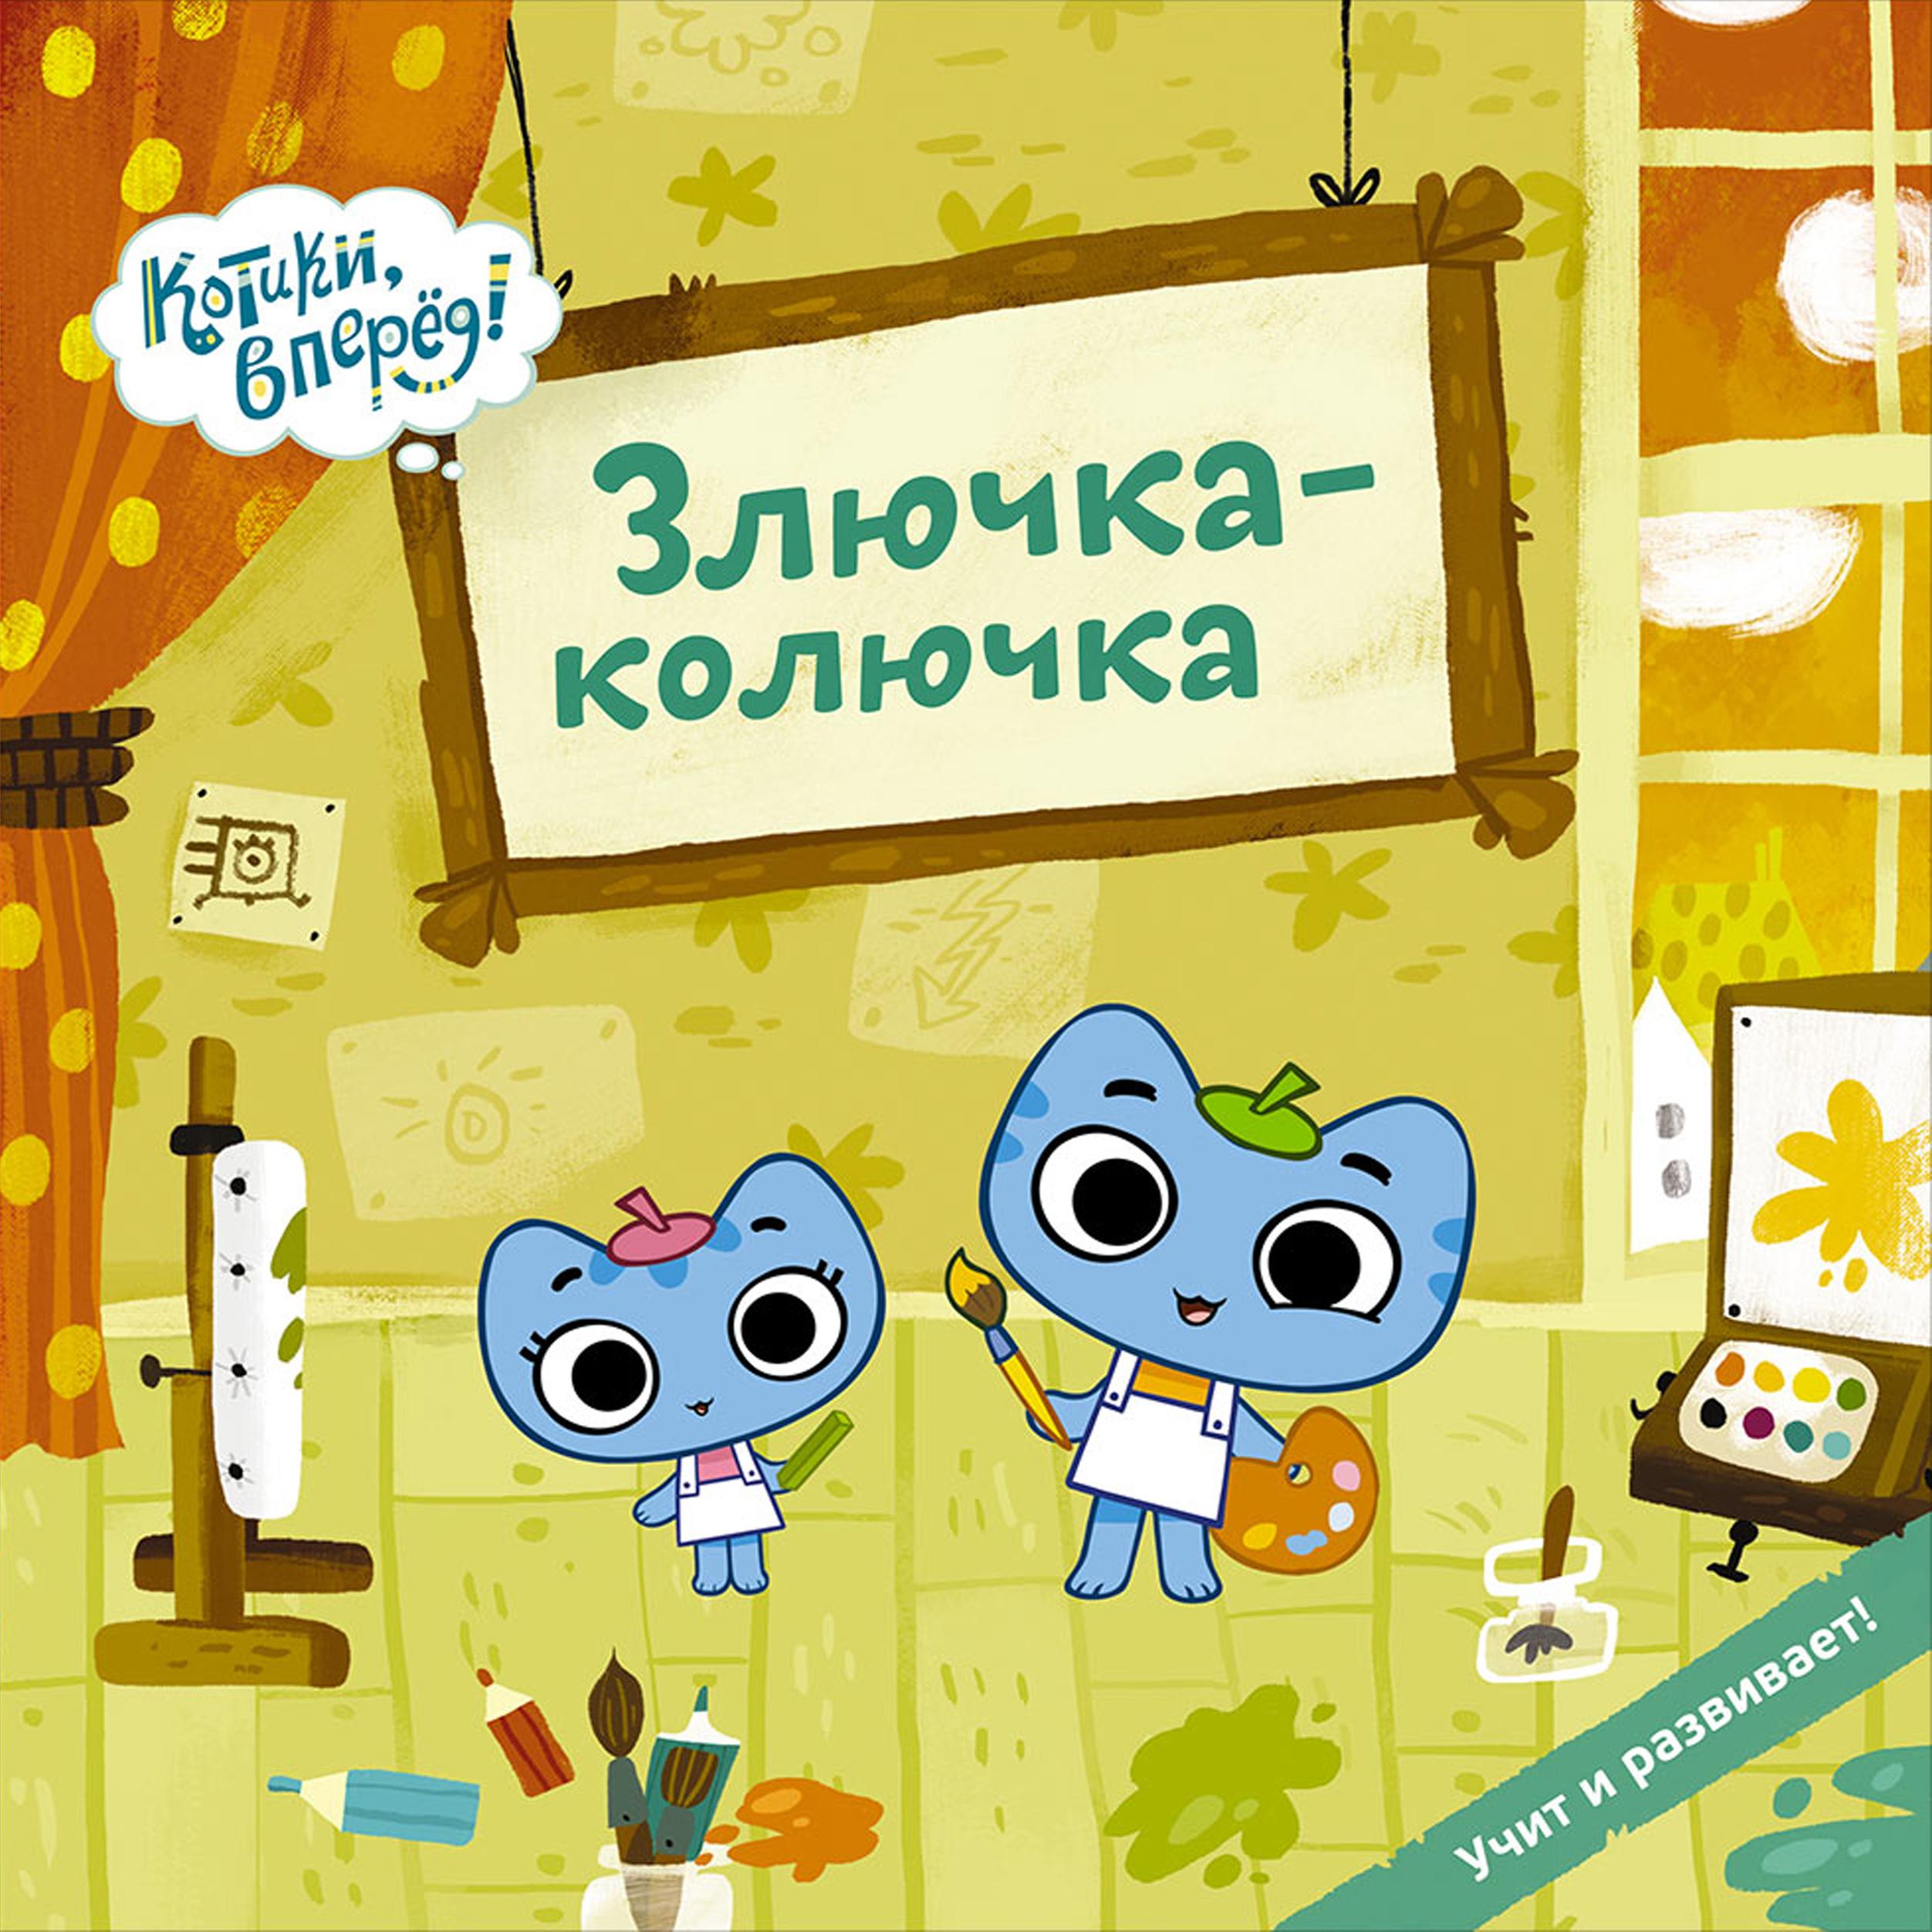 Toonbox Studio Злючка-колючка toonbox studio книга котики вперёд большое сафари от 3 до 6 лет